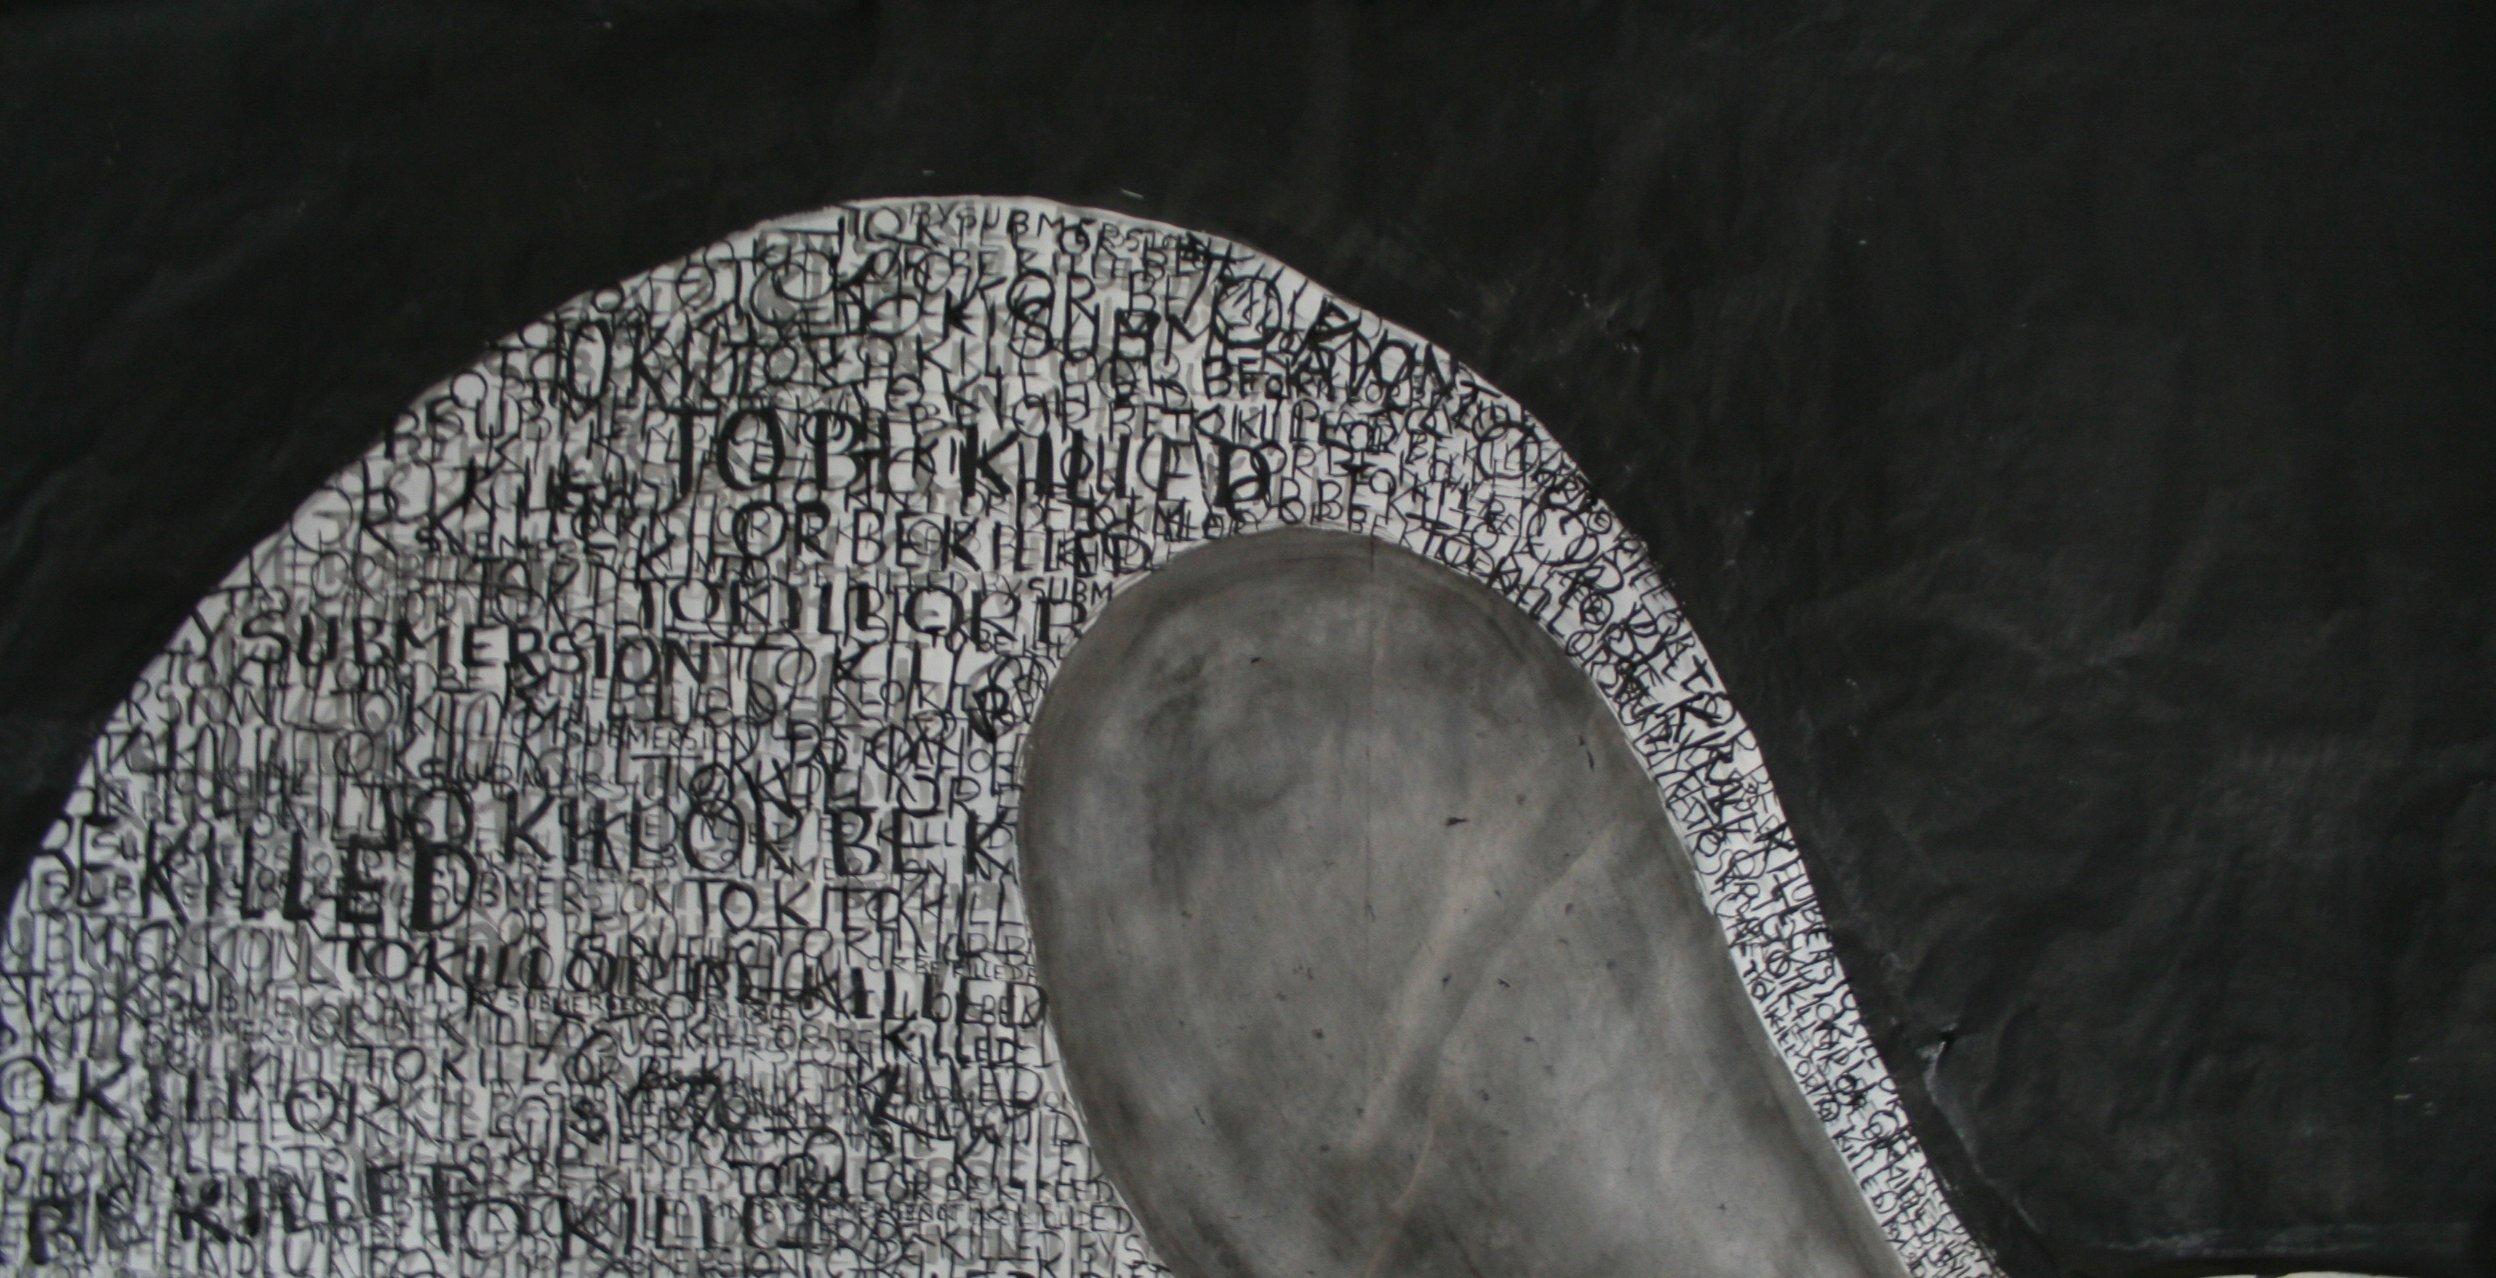 painting of black wave crashing